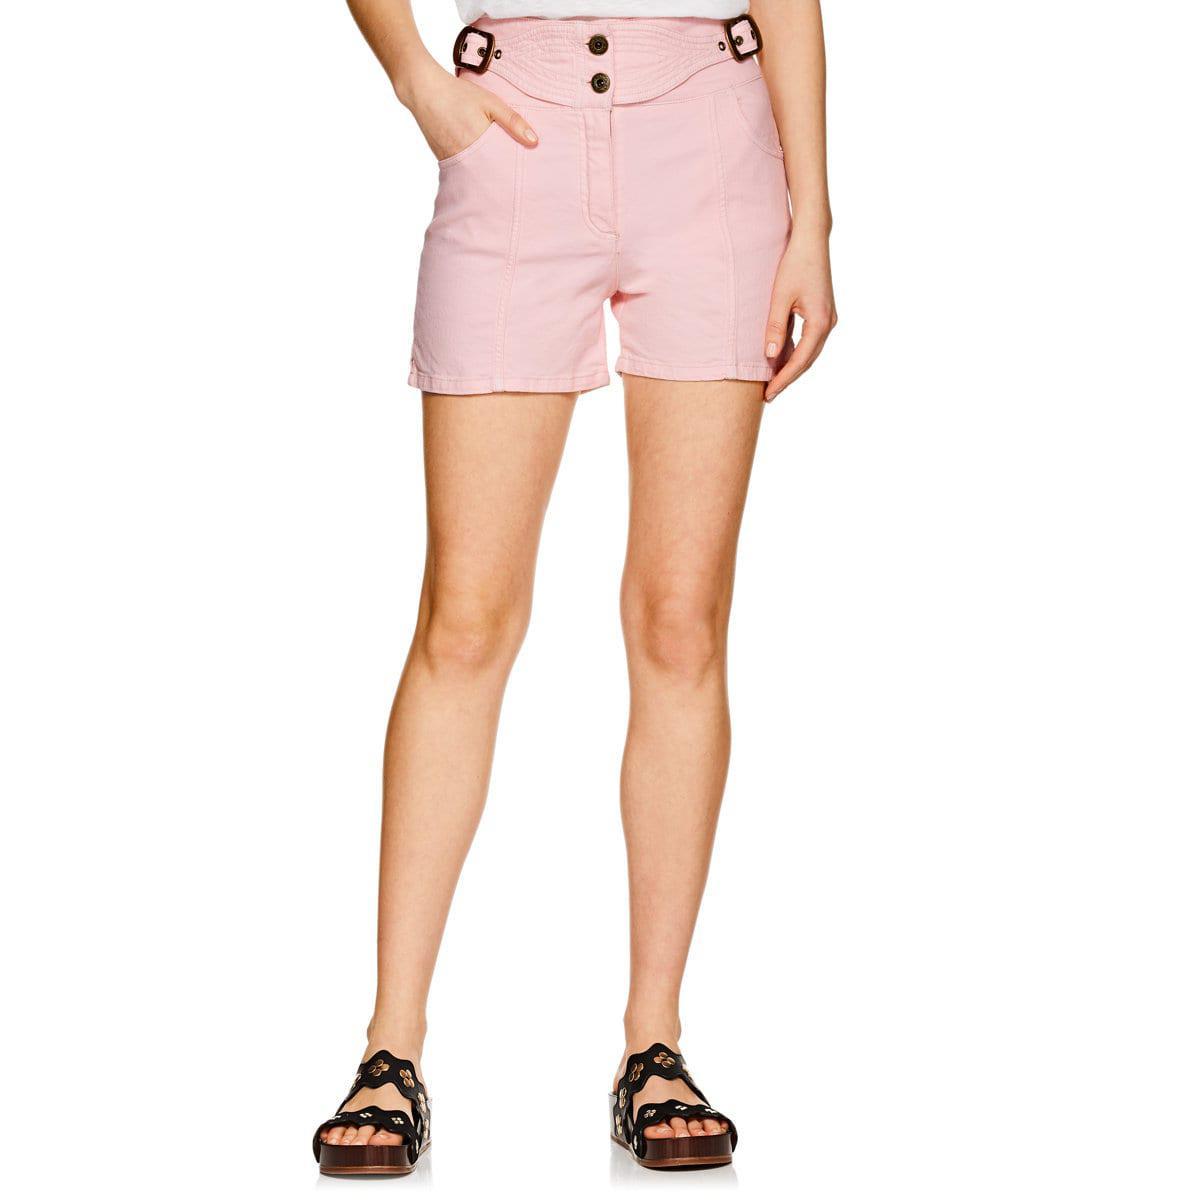 928a9ff9654 Lyst - Chloé Denim Belted High-waist Shorts in Pink